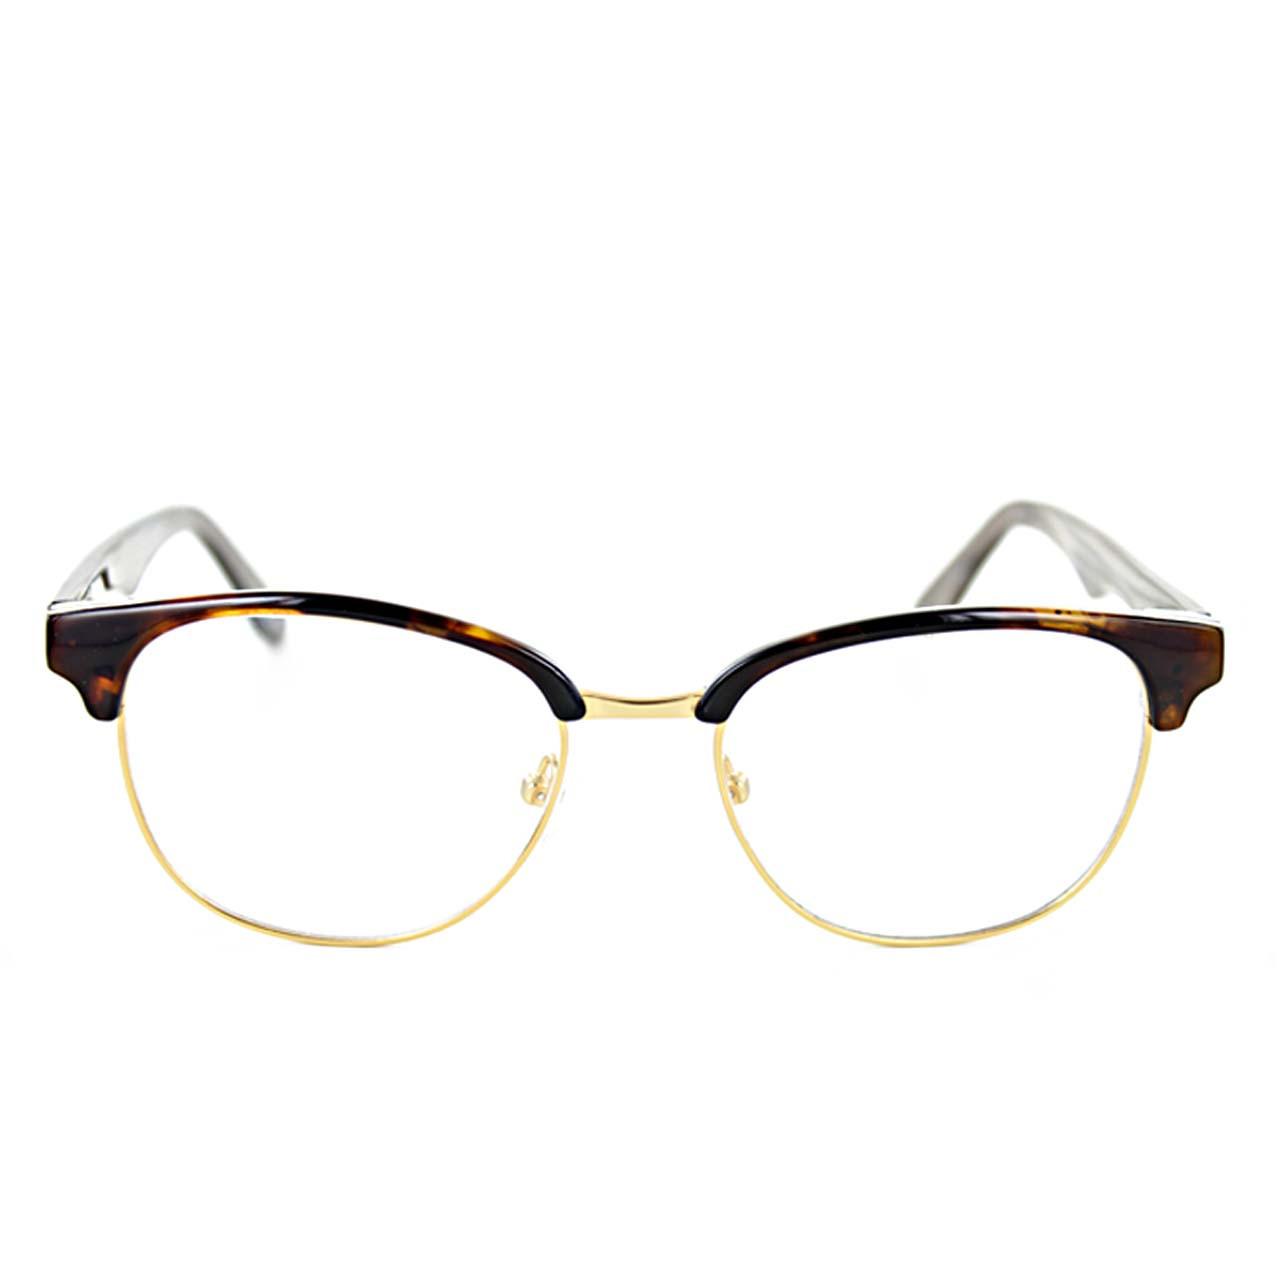 GEEK Eyewear Style Quantum Model Emma